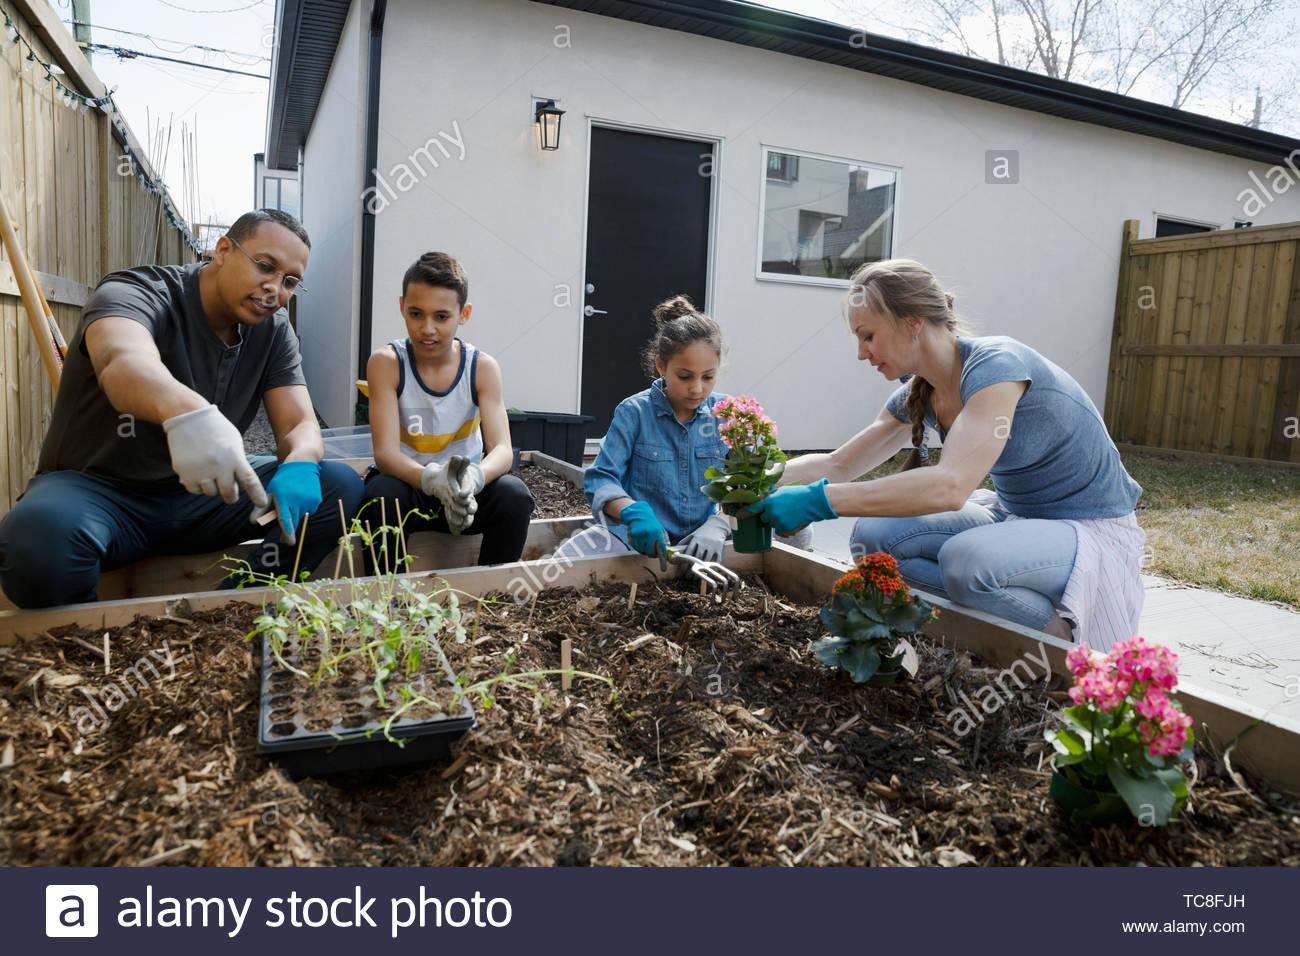 Family planting flowers in sunny garden - Stock Image